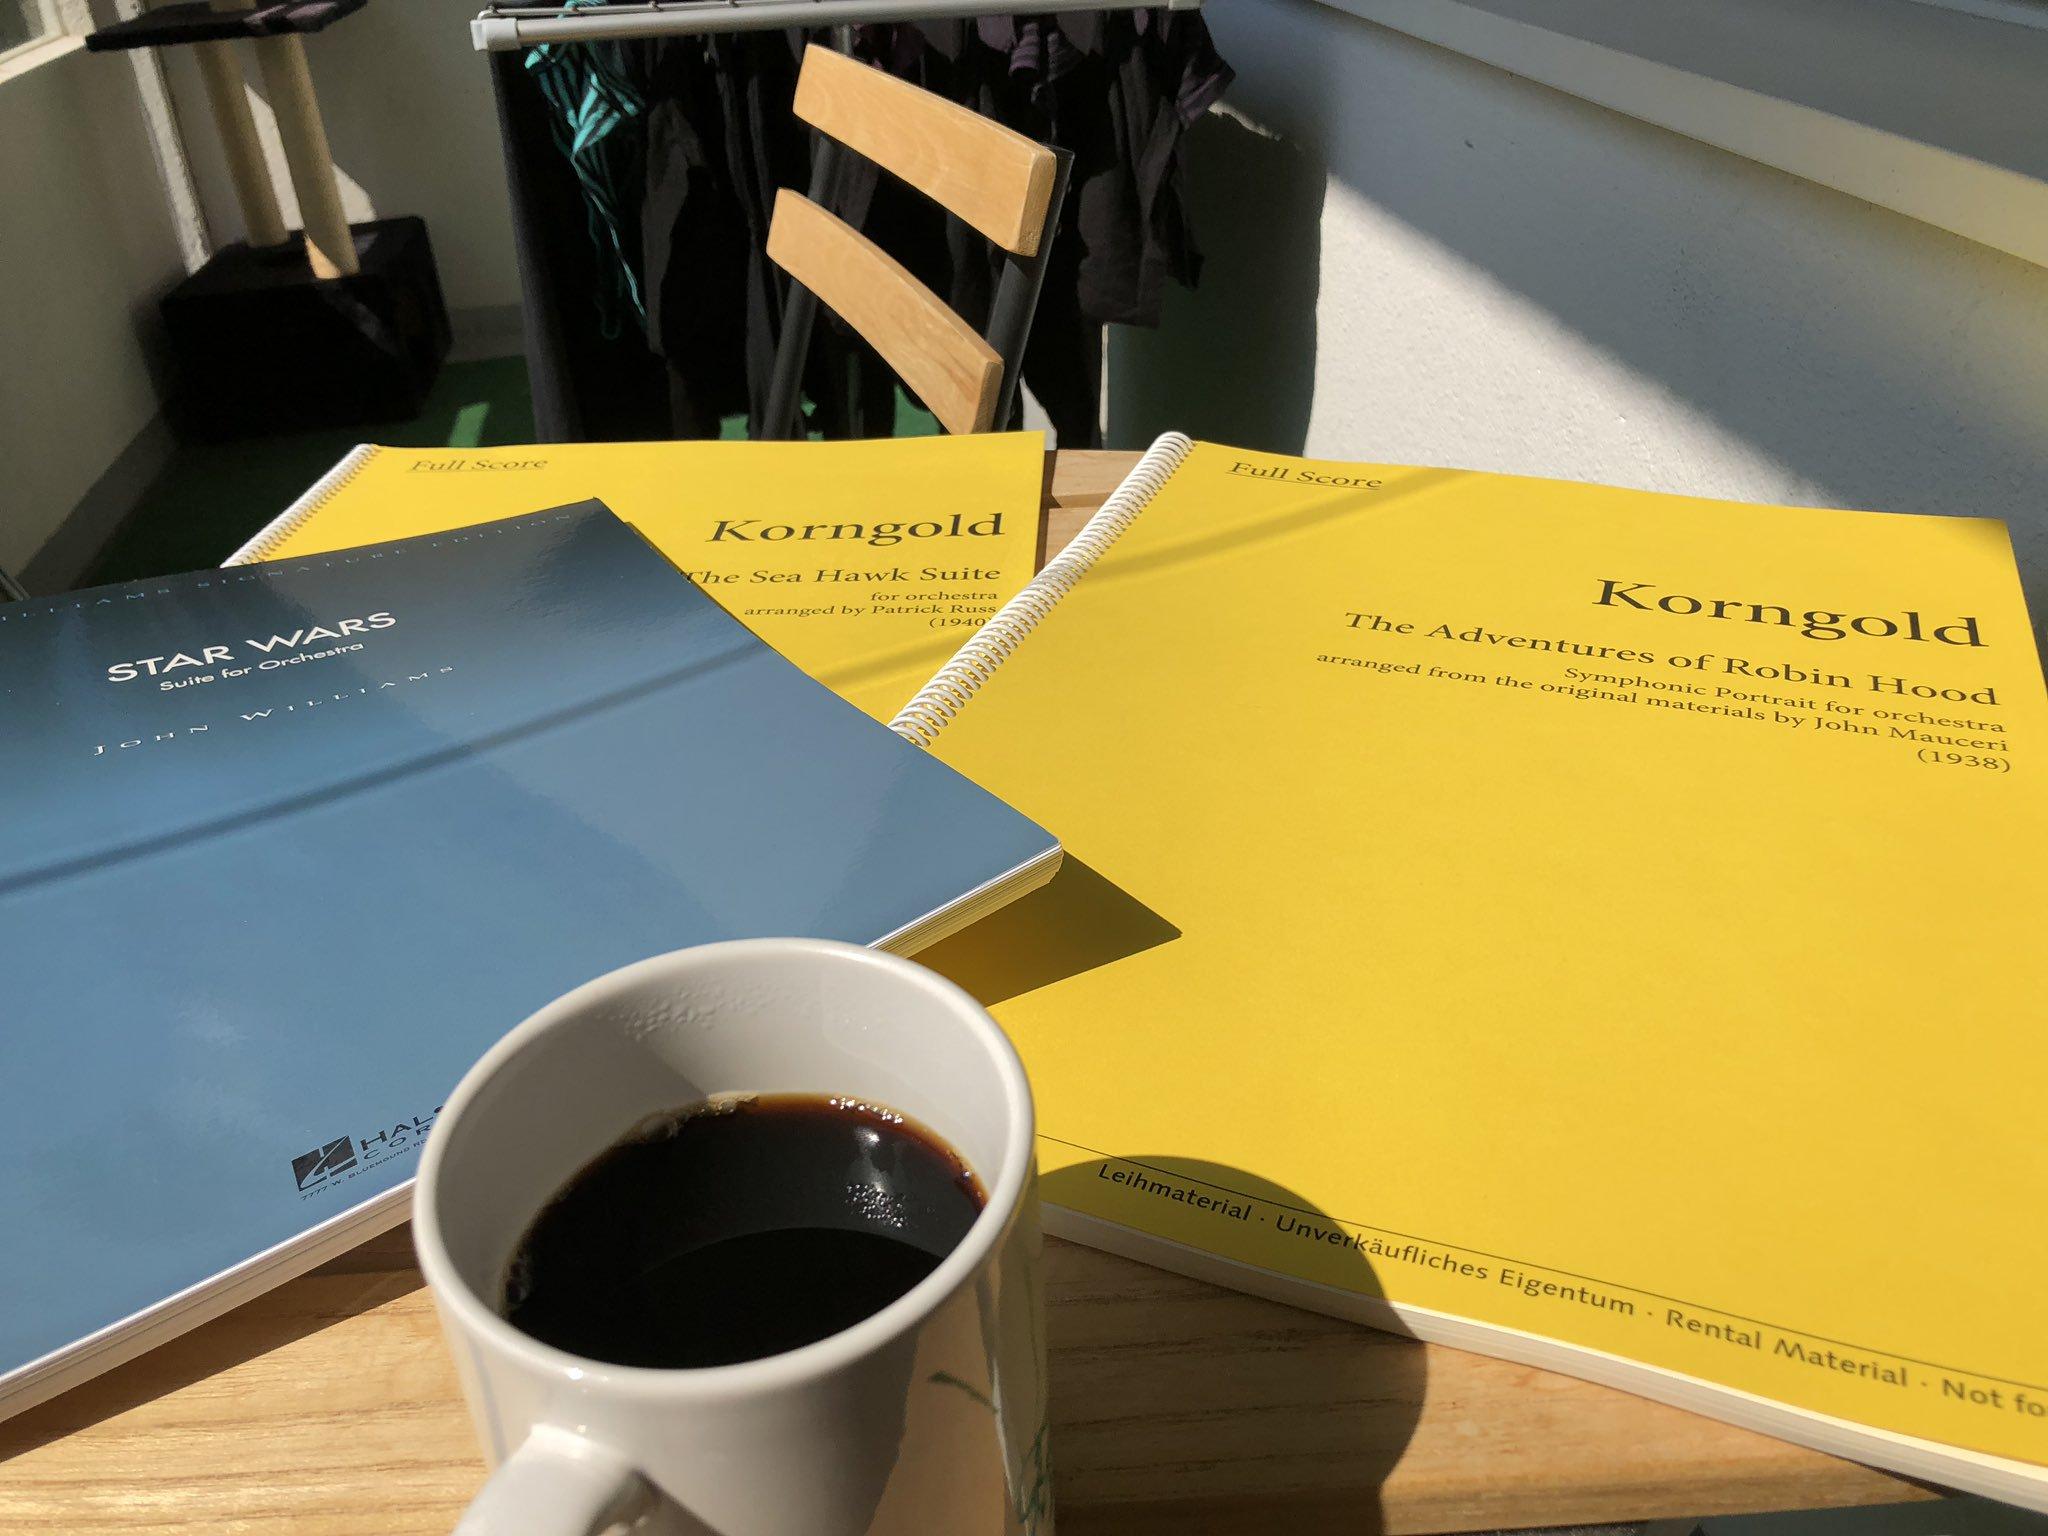 Jari Kallio, scores, Bärenreiter, publishing, music, coffee, perusal